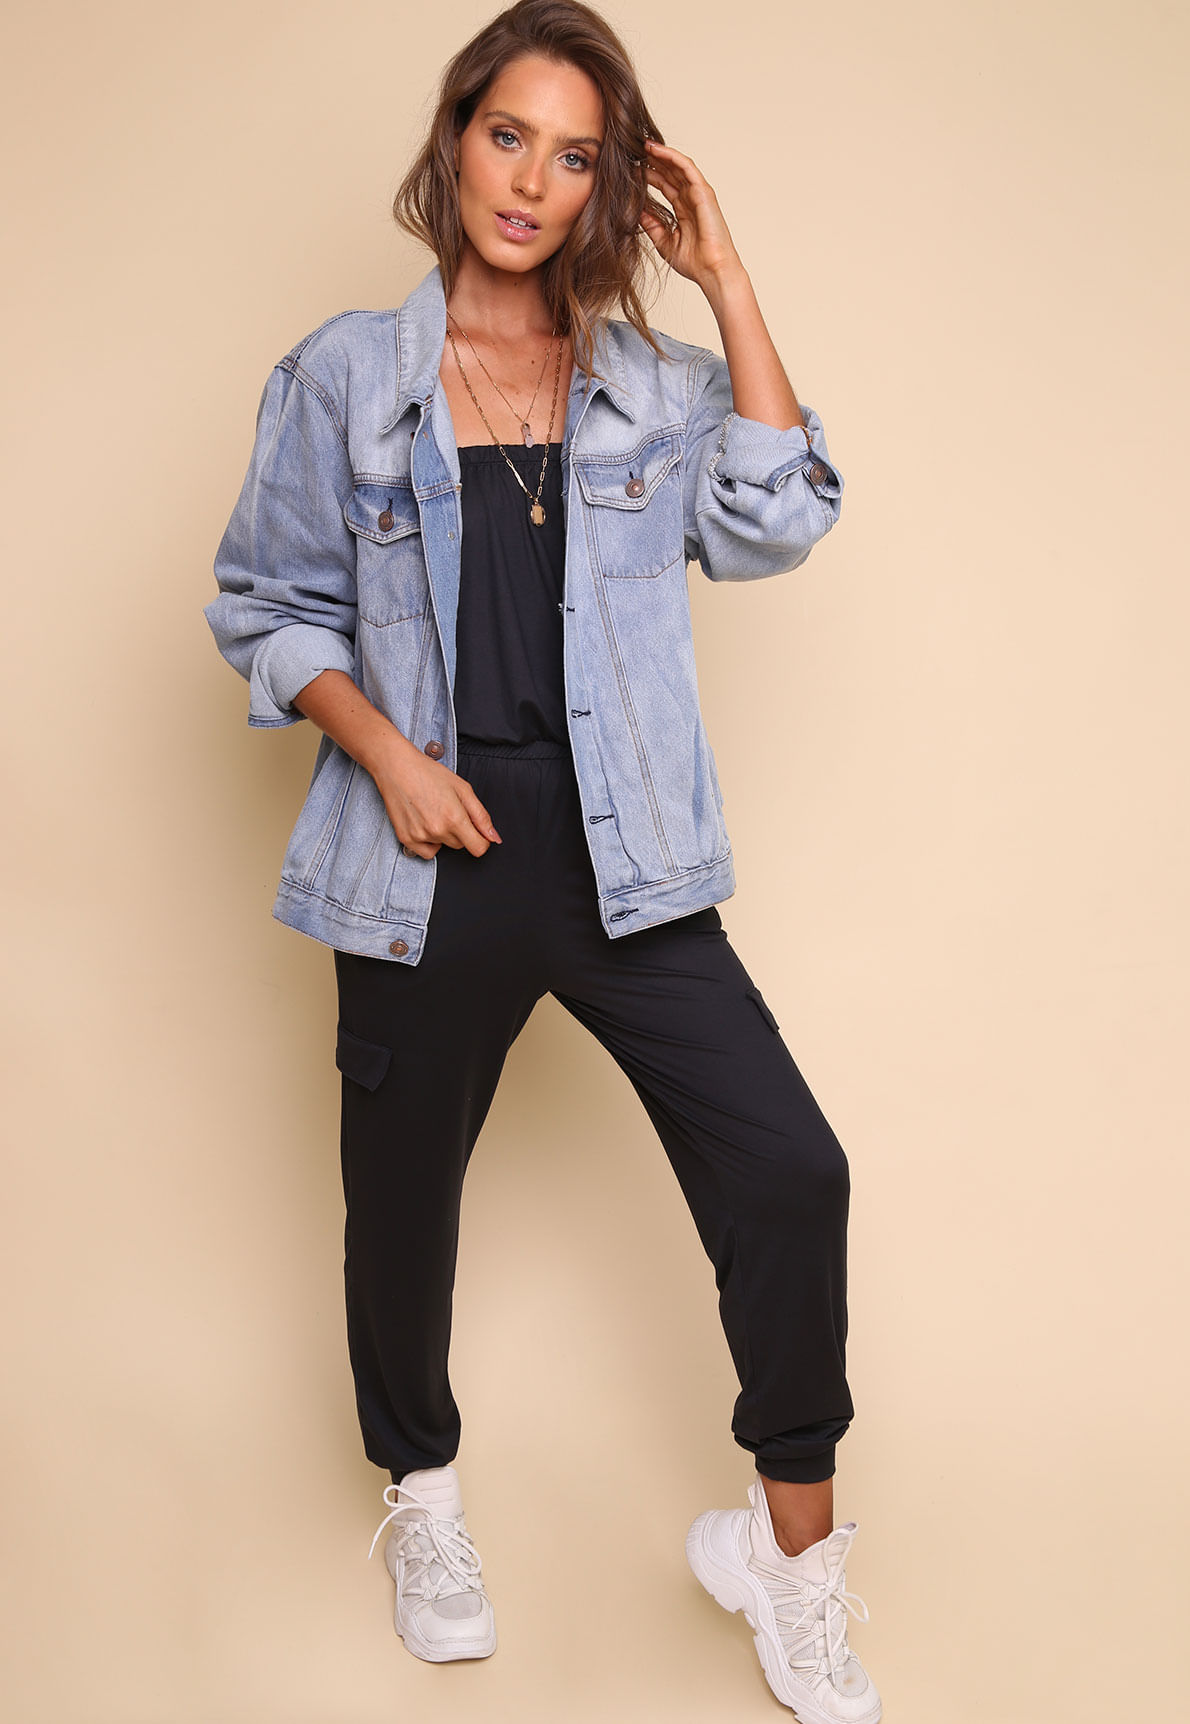 29571-jaqueta-jeans-oversized-abby-mundo-lolita-11